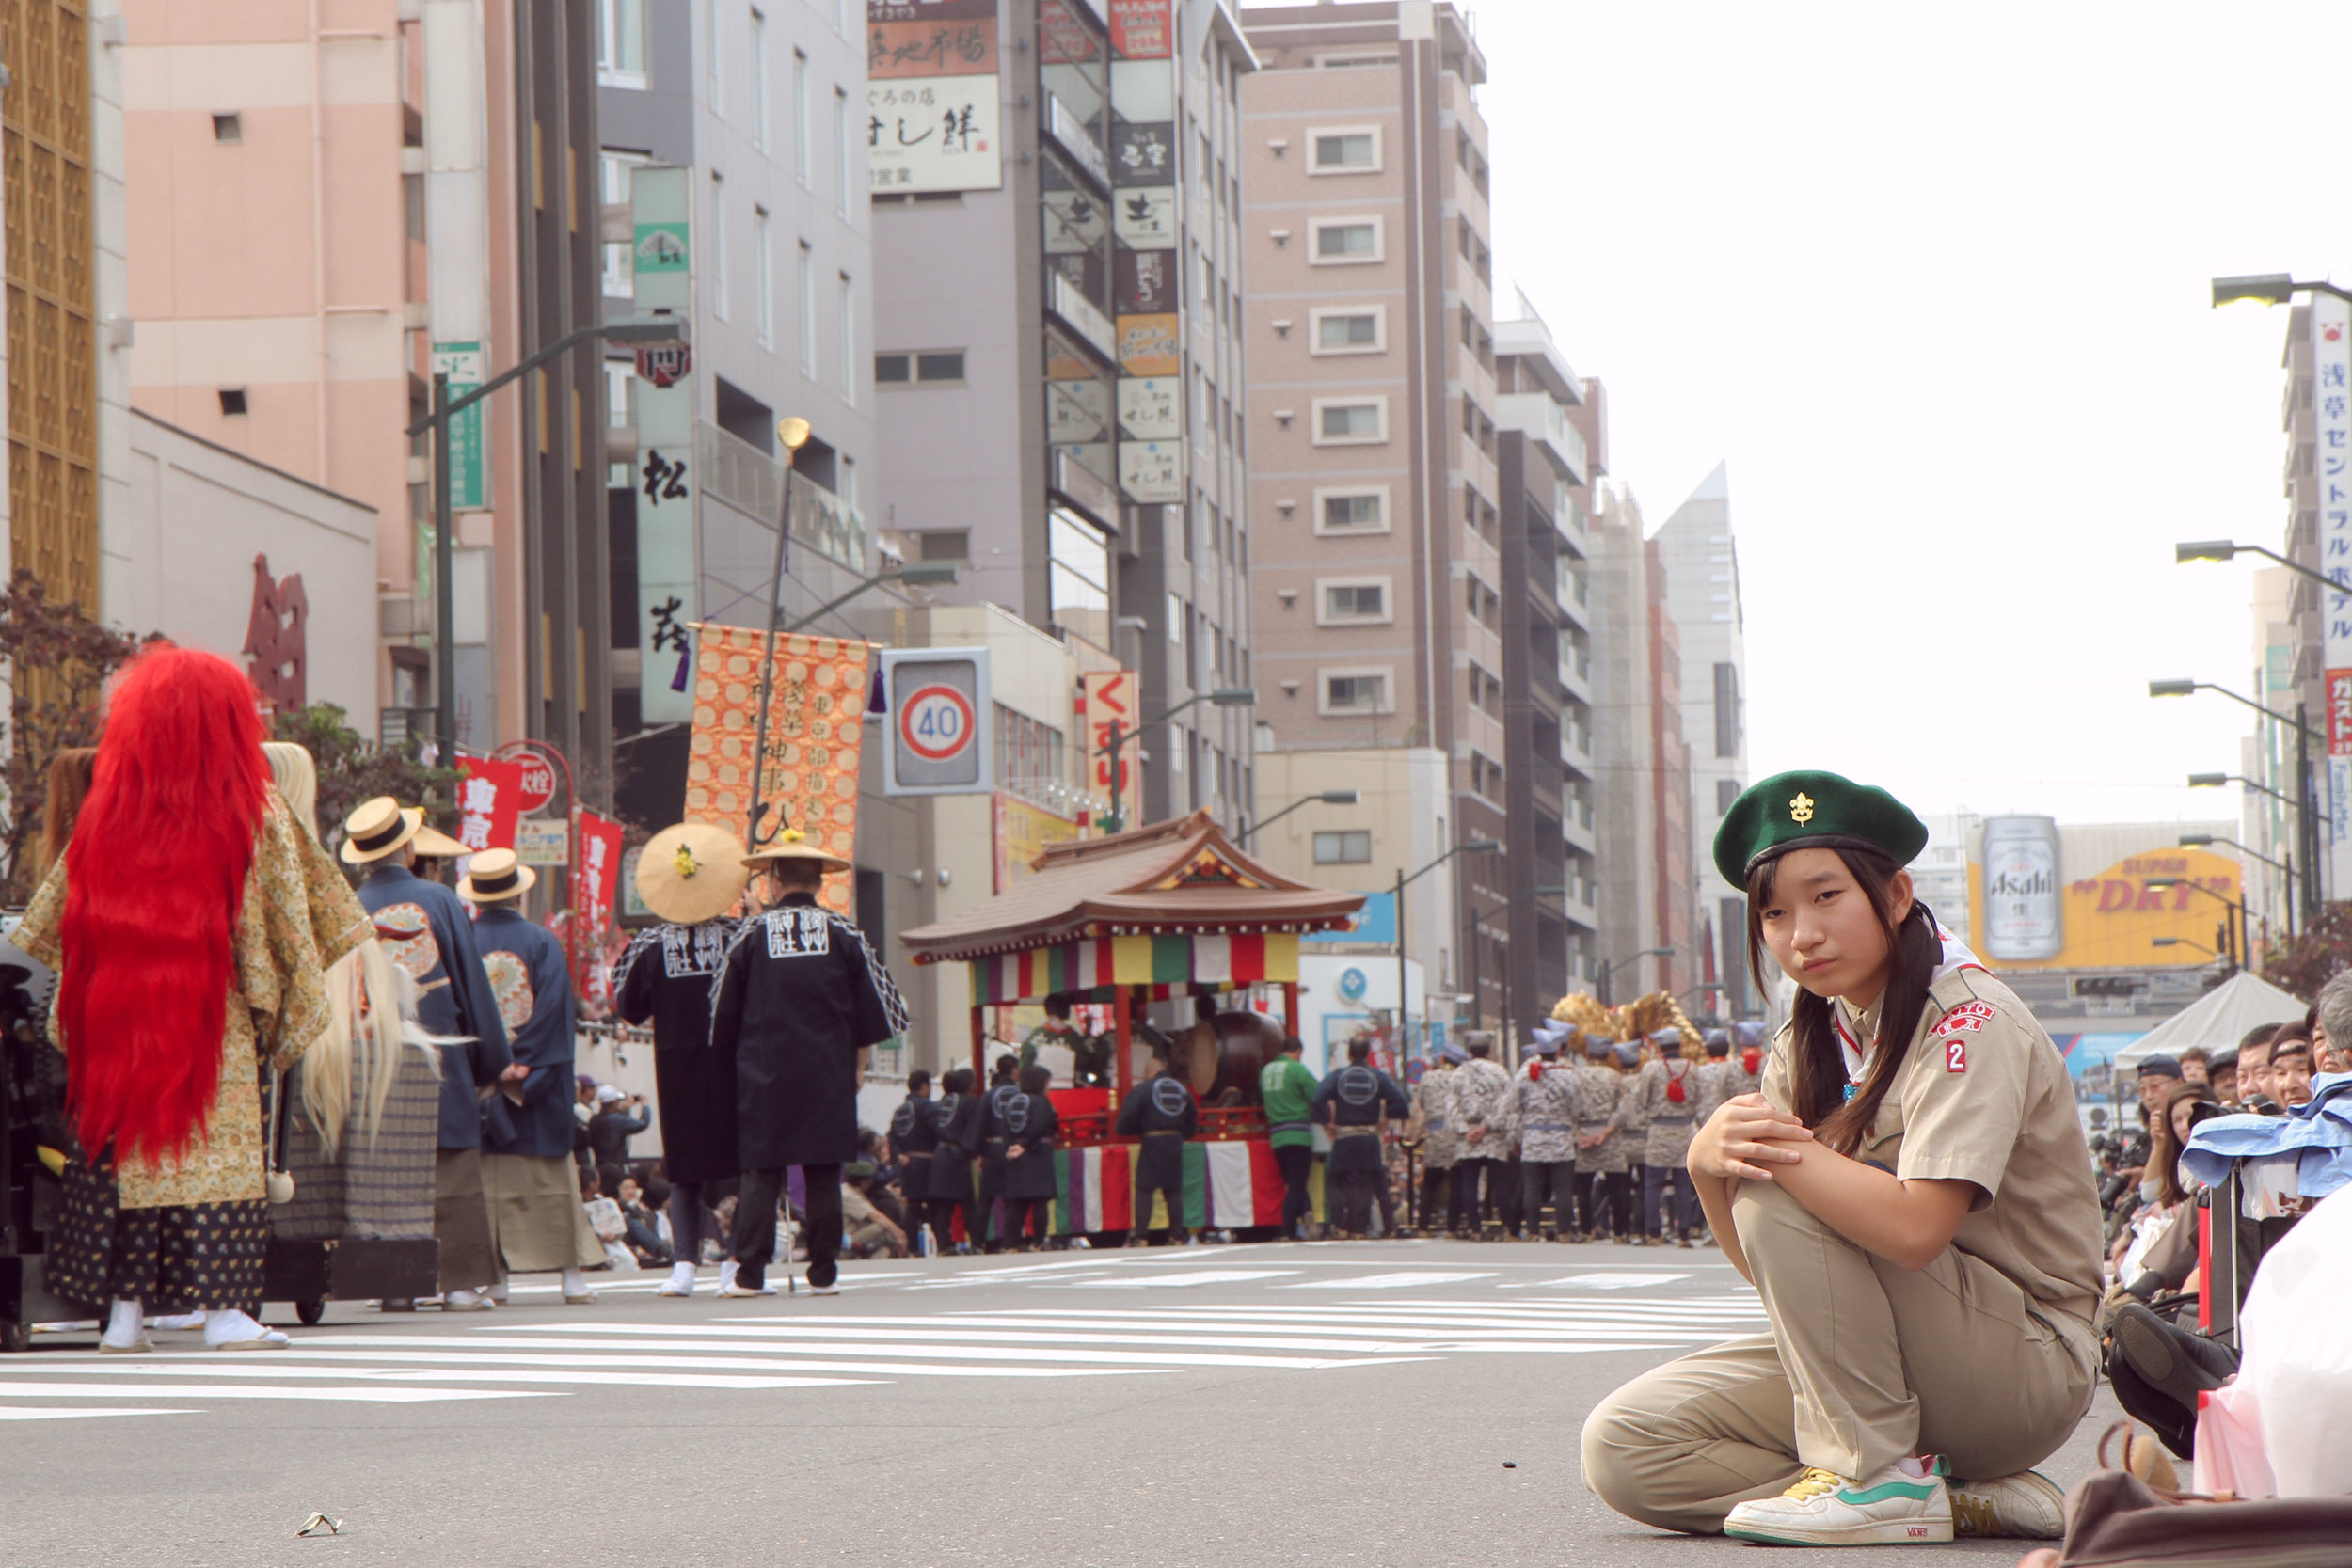 Girl-Scout-at-Parade.jpg